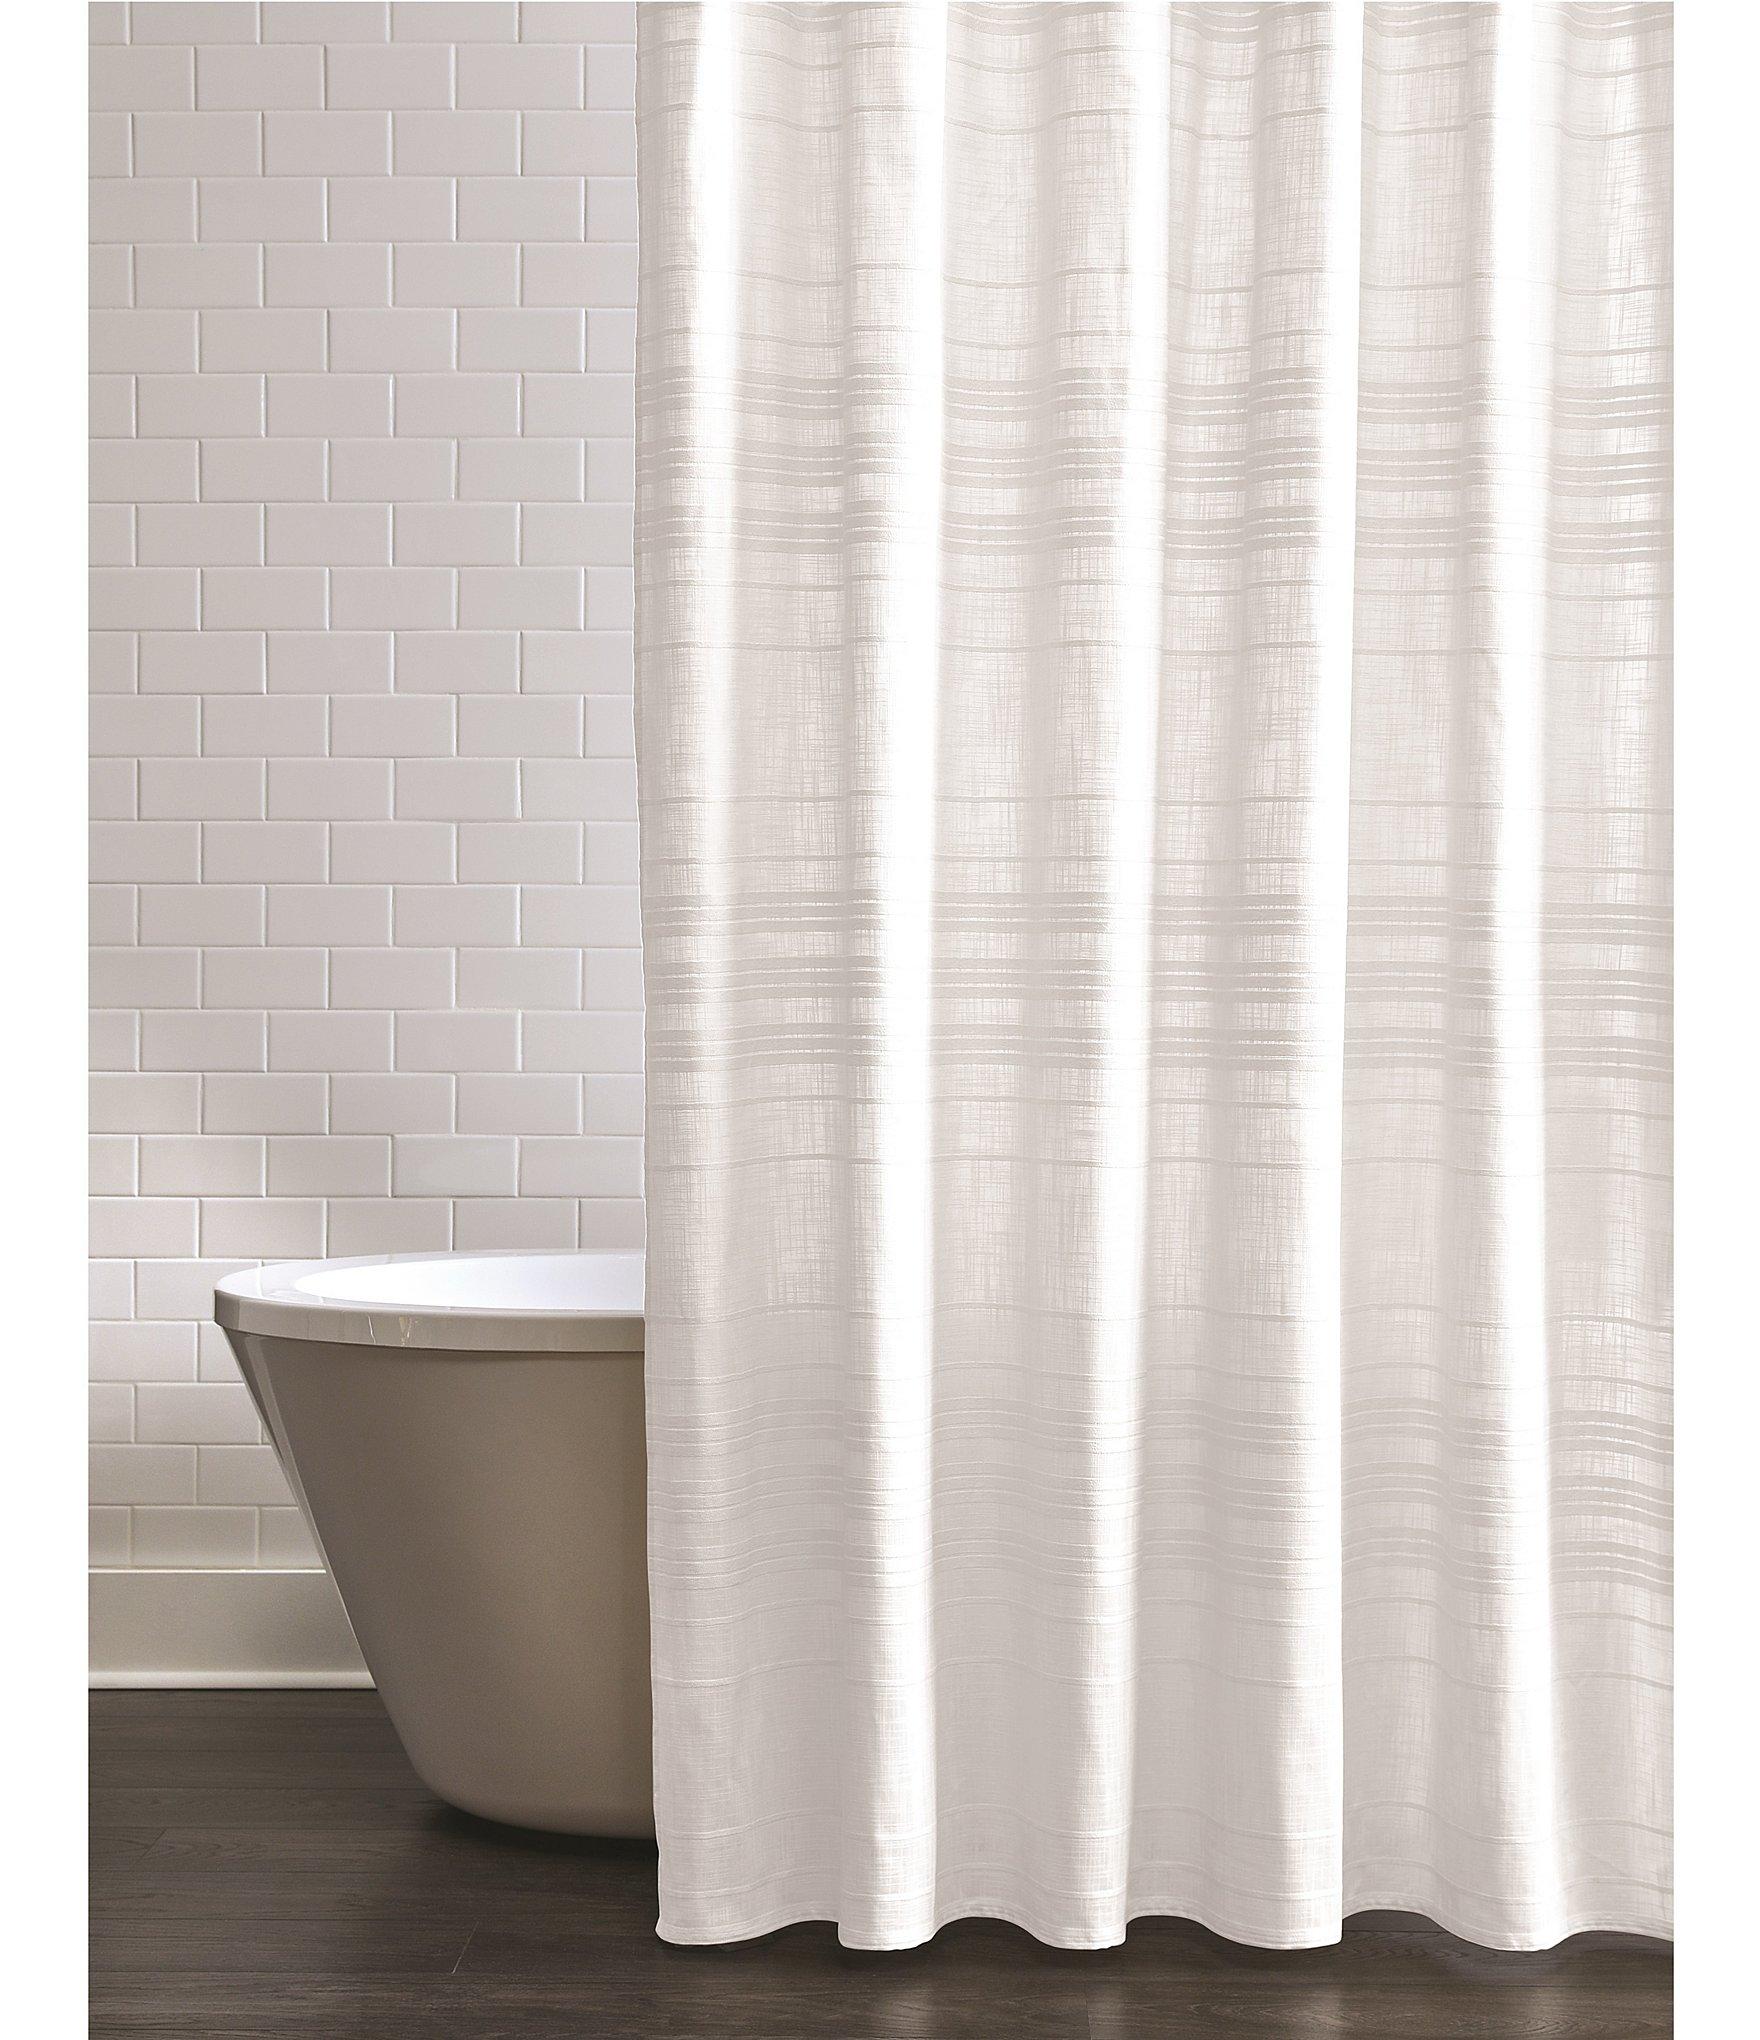 Shower Curtains Shower Rings Dillard S